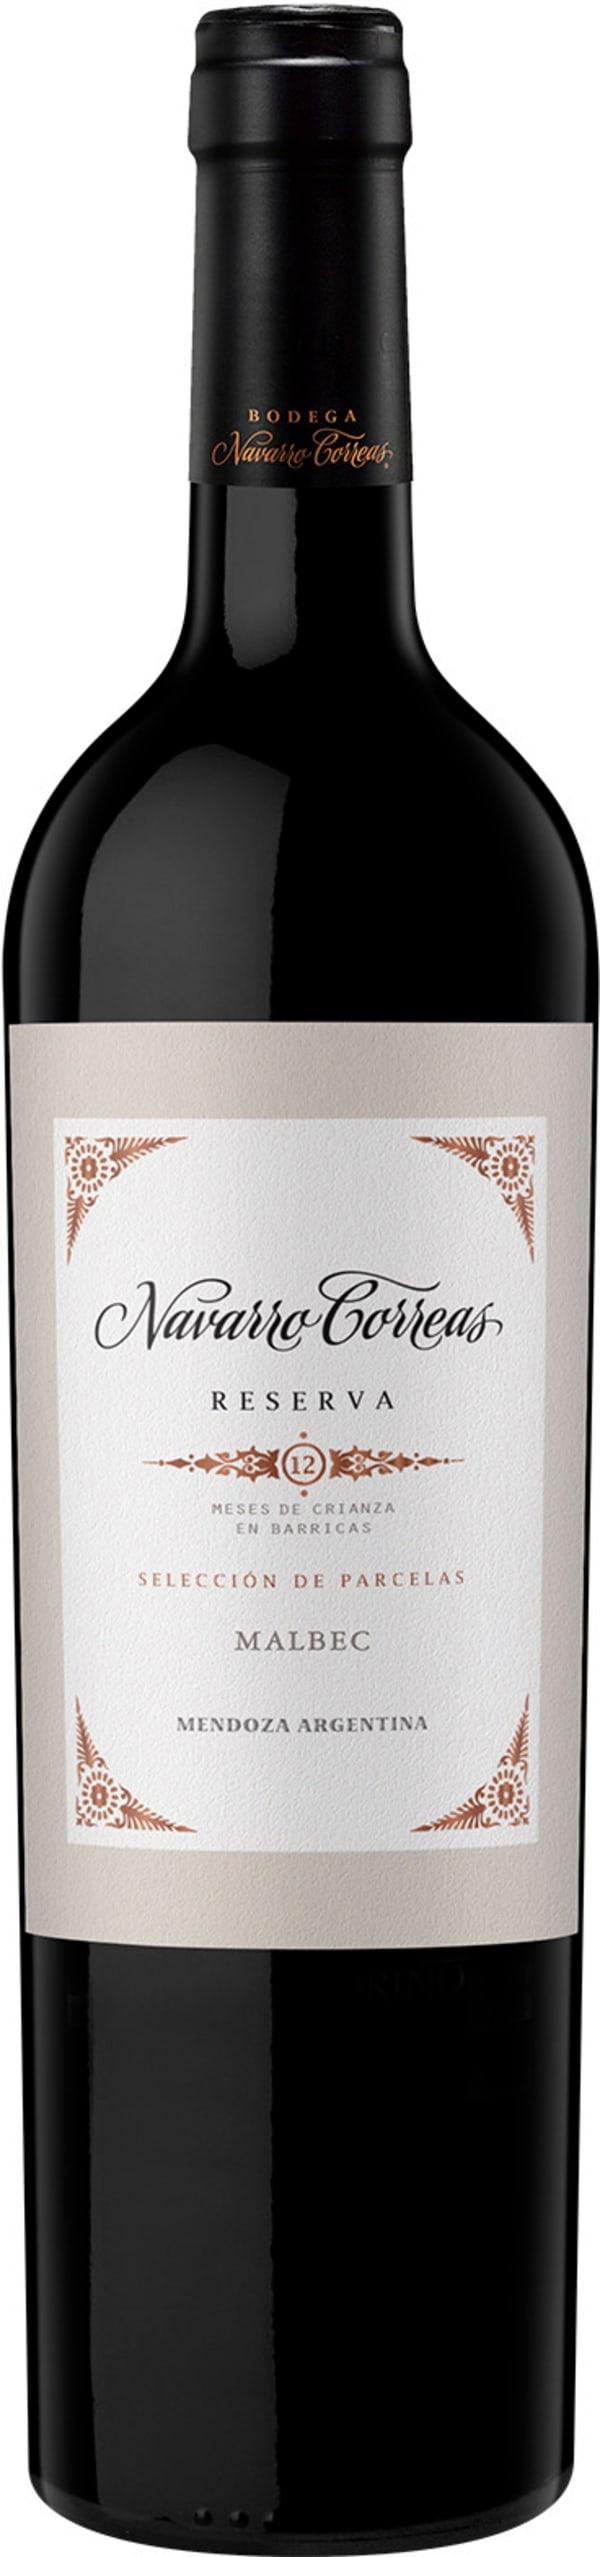 Navarro Correas Reserve Malbec 2017